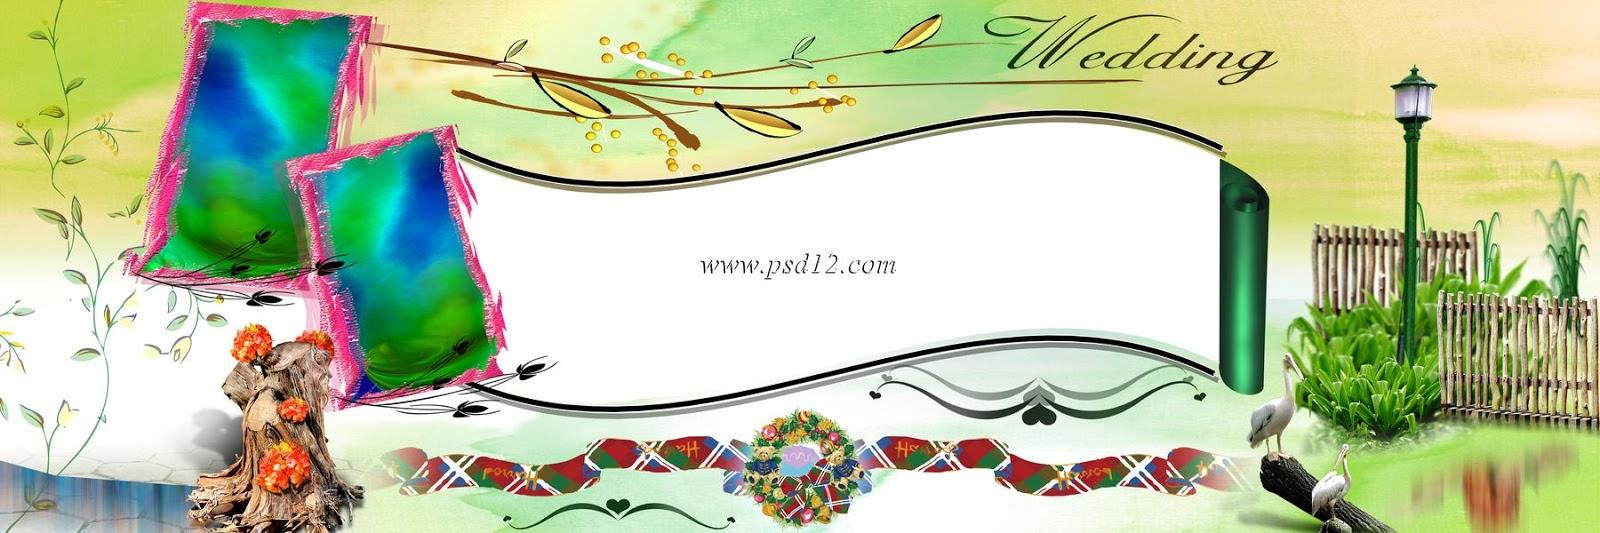 Photoshop clipart karizma album Photoshop Album 11 (12x36 Wedding